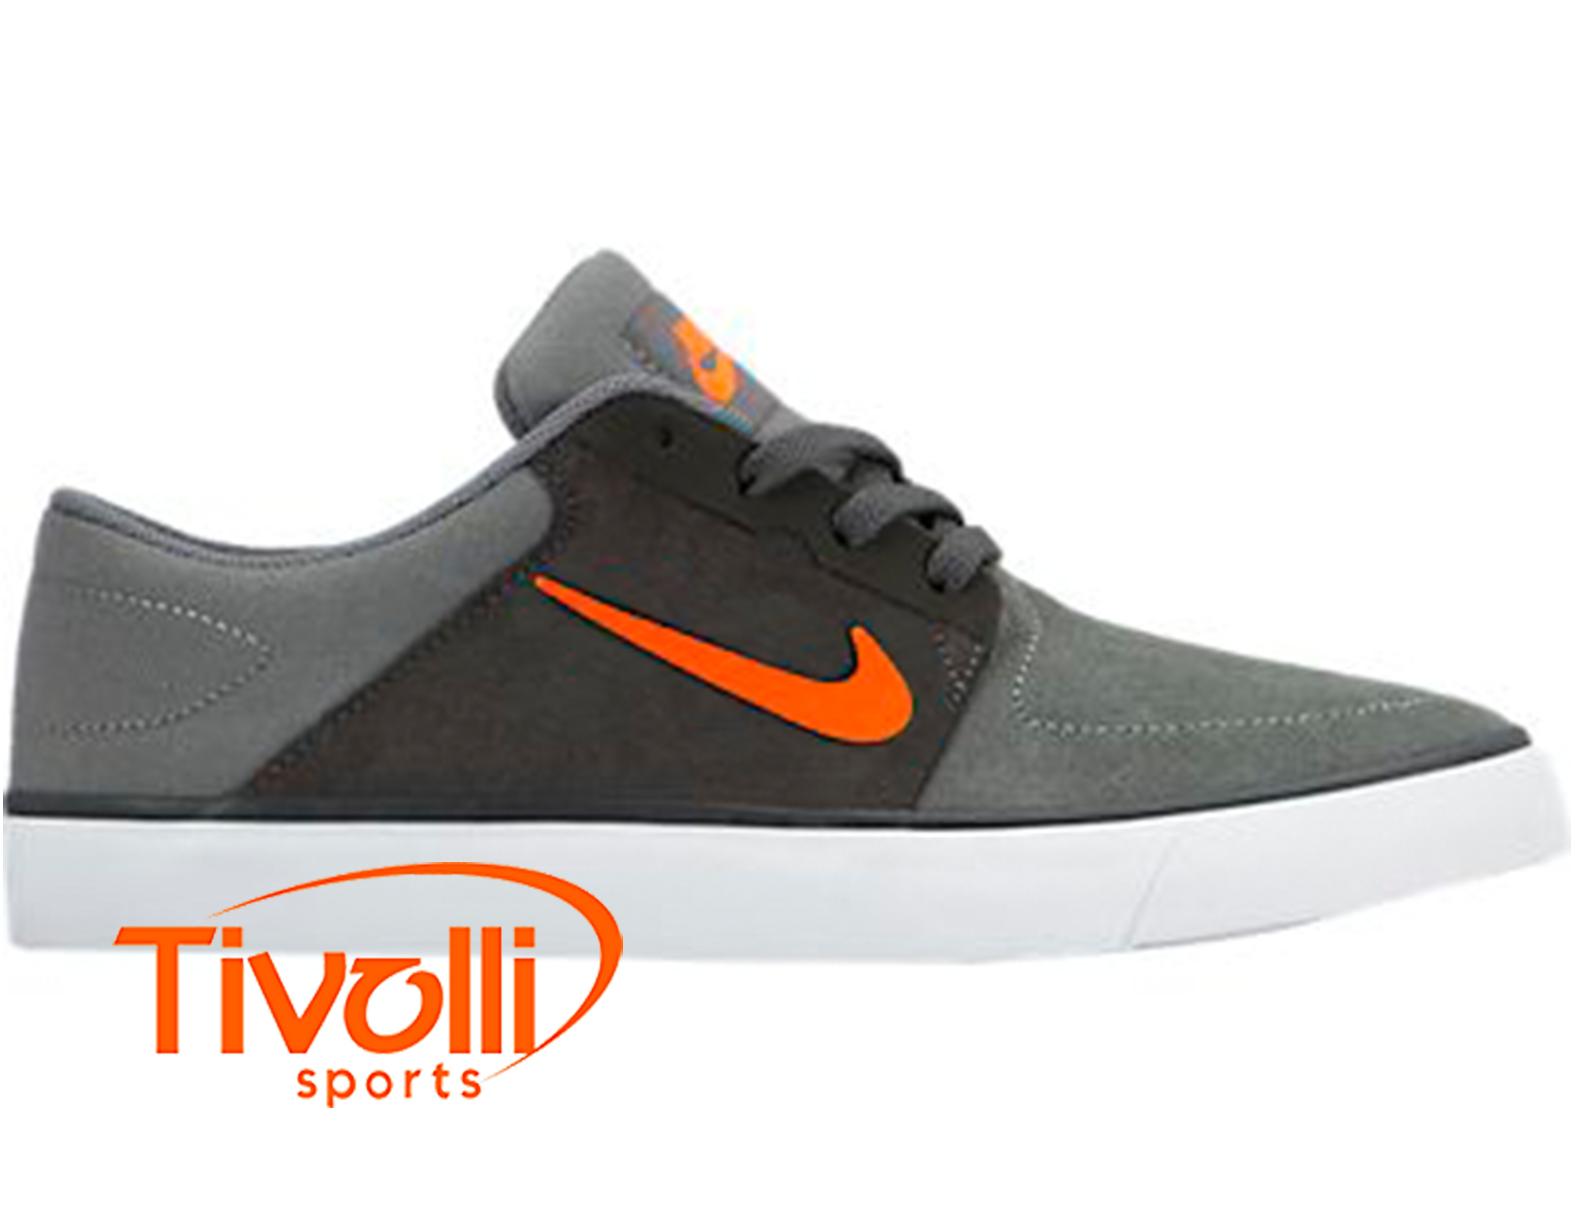 Exclusión negro equivocado  Tênis Nike SB Portmore (GS) > Juvenil cinza, laranja e branco >